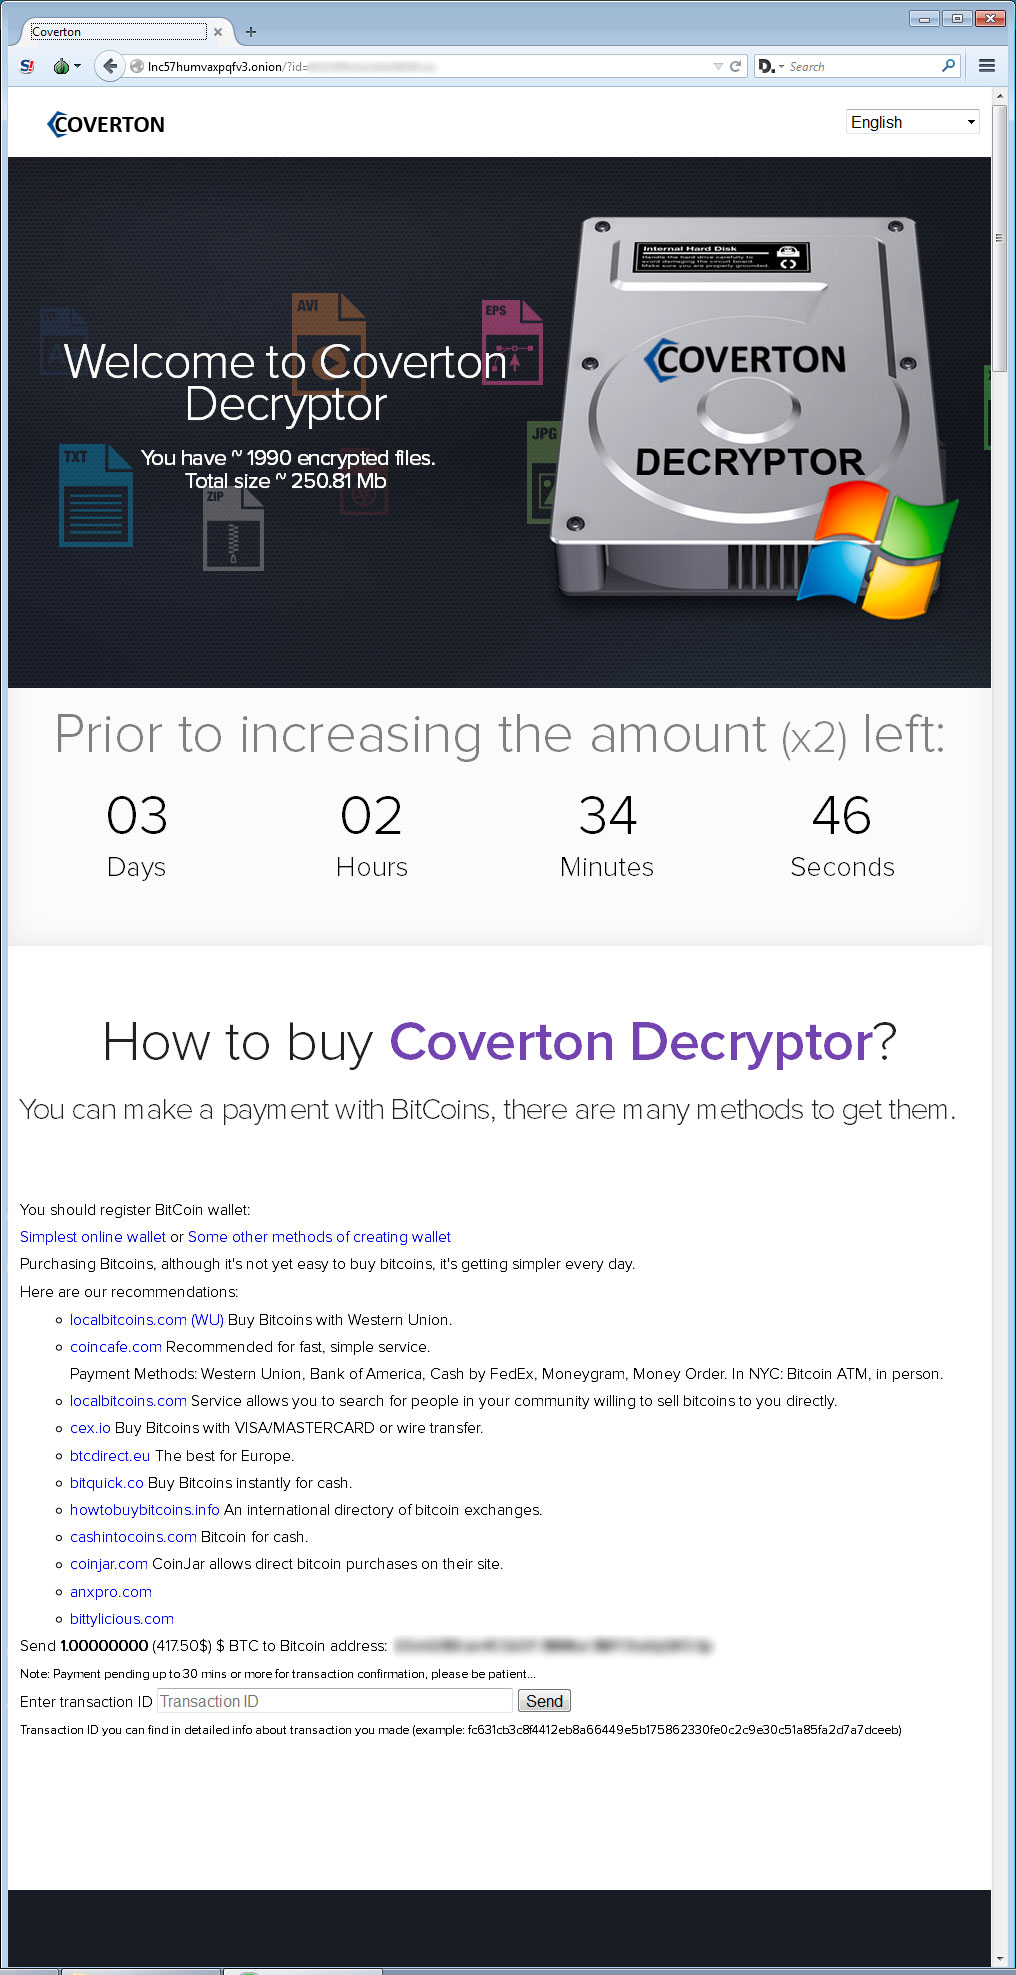 coverton-decryptor.jpg